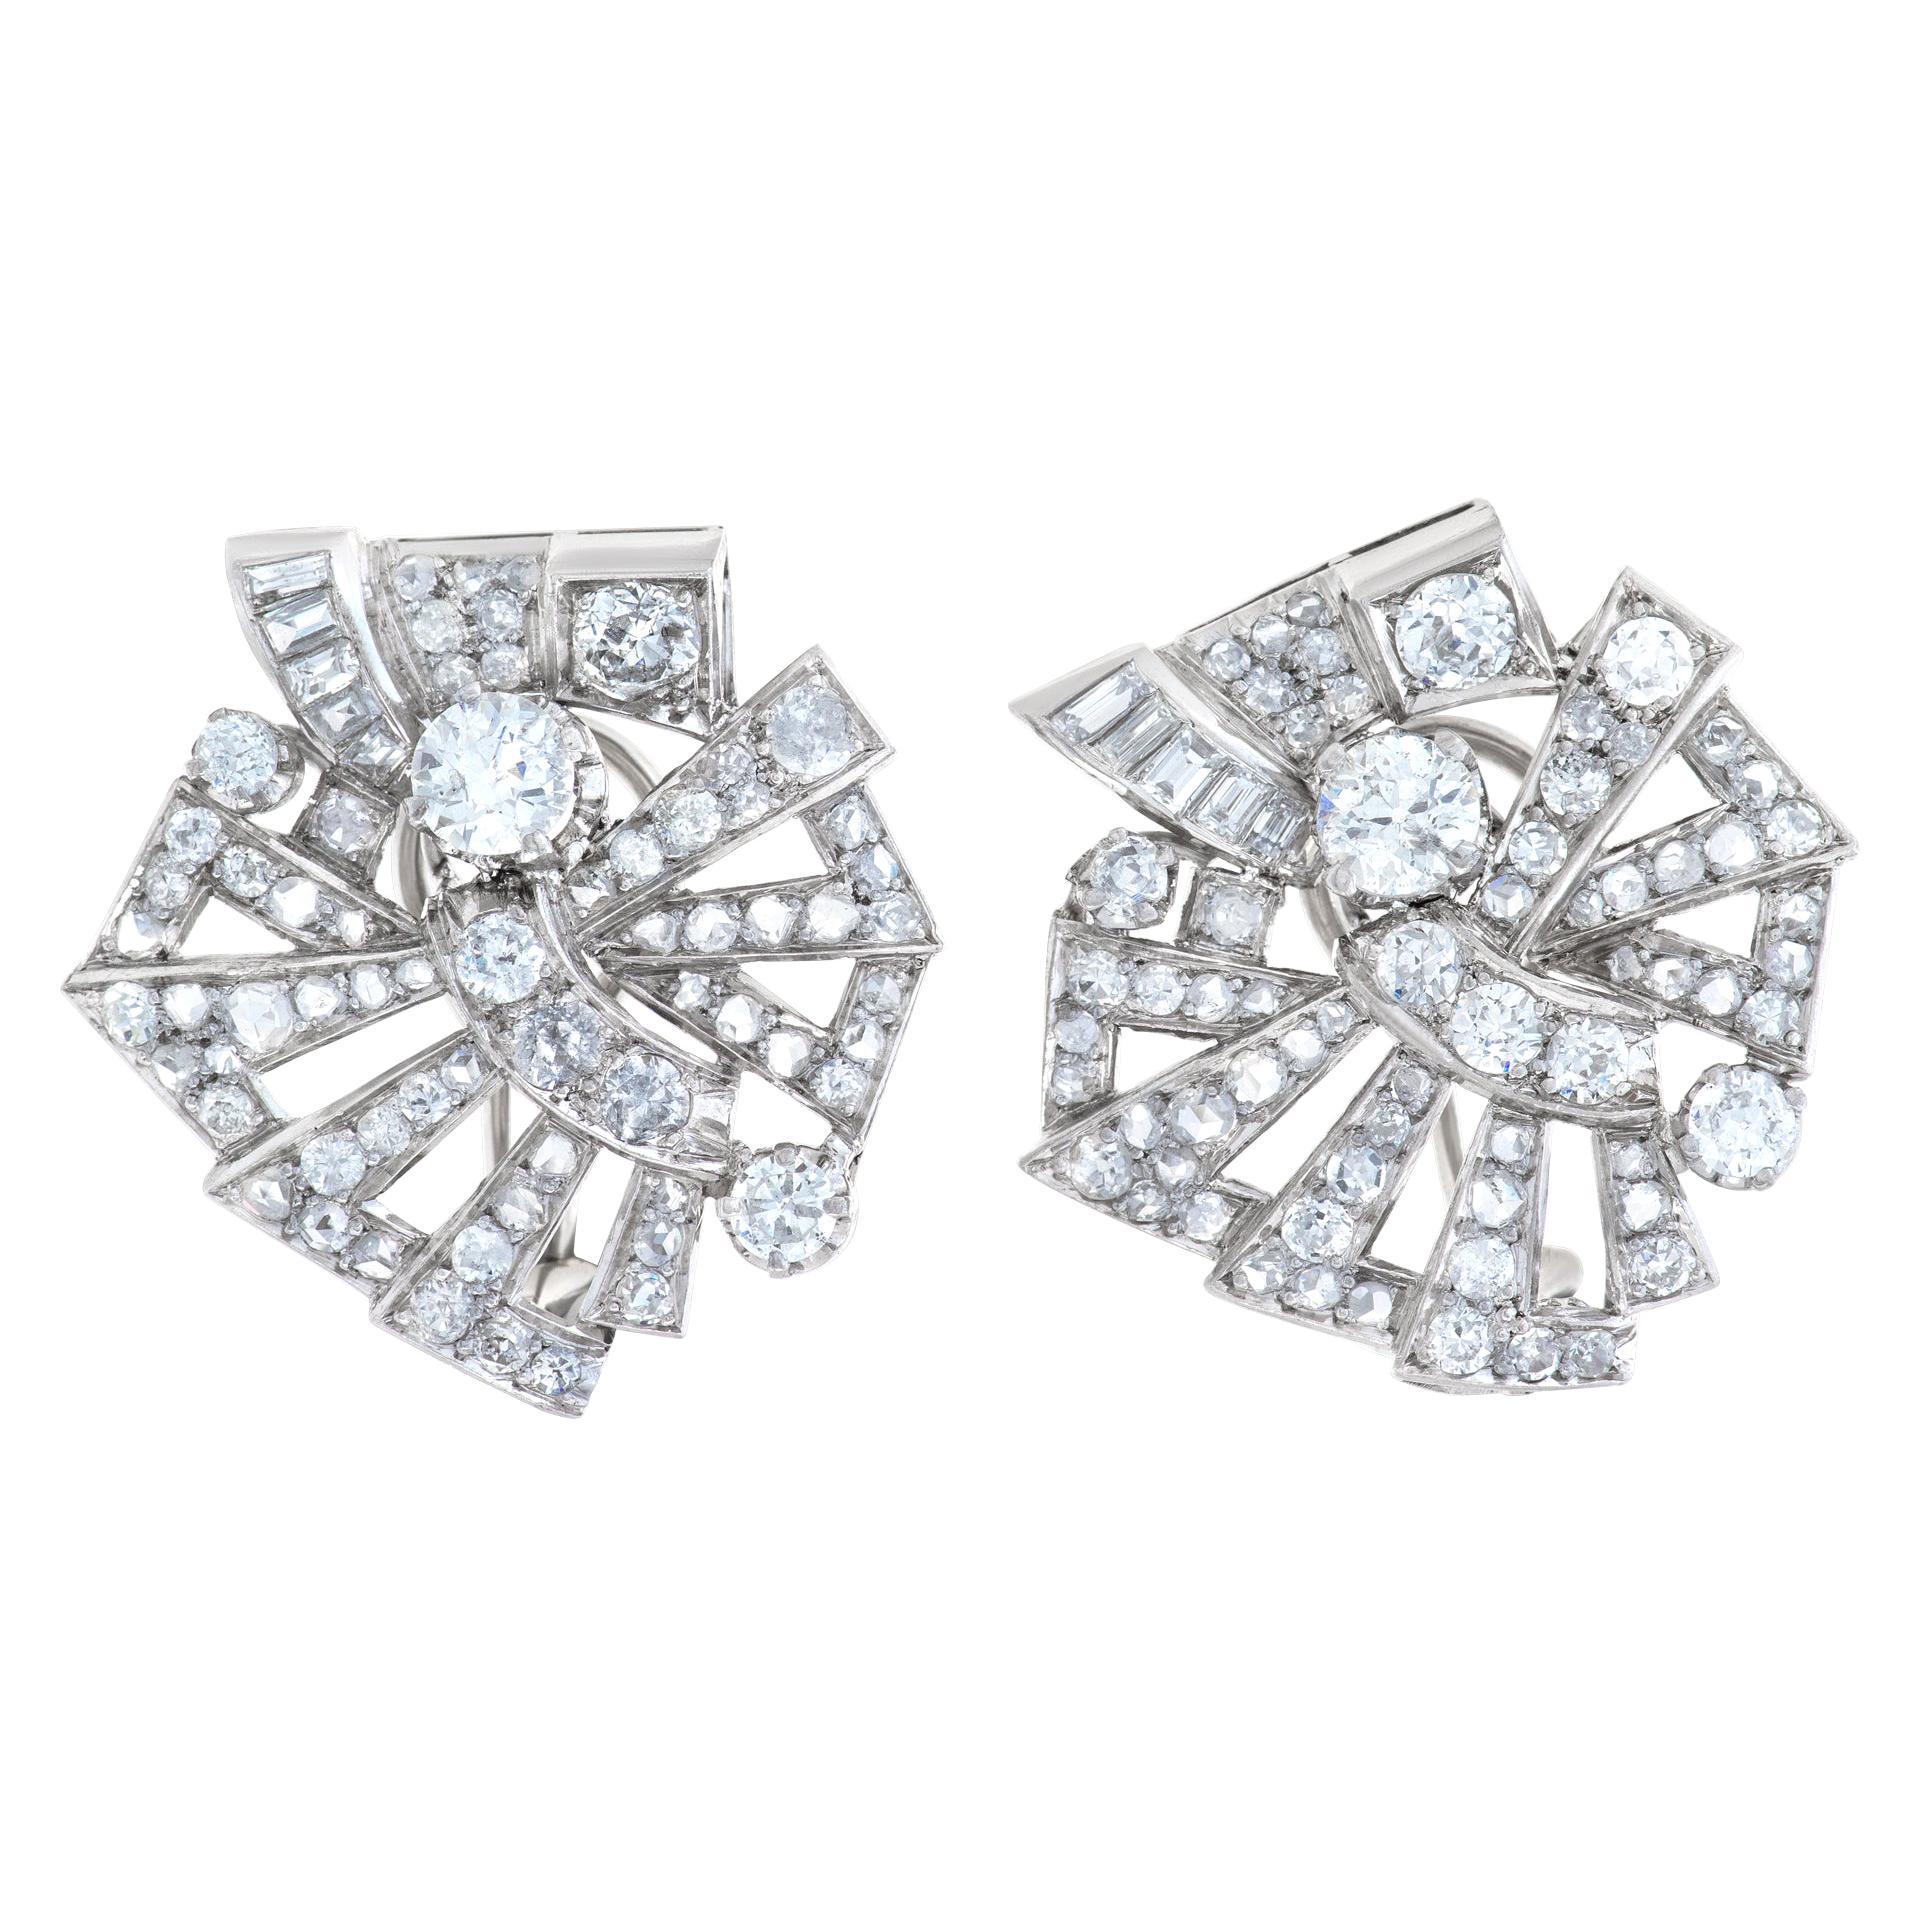 Art Deco Diamond Earrings in Platinum